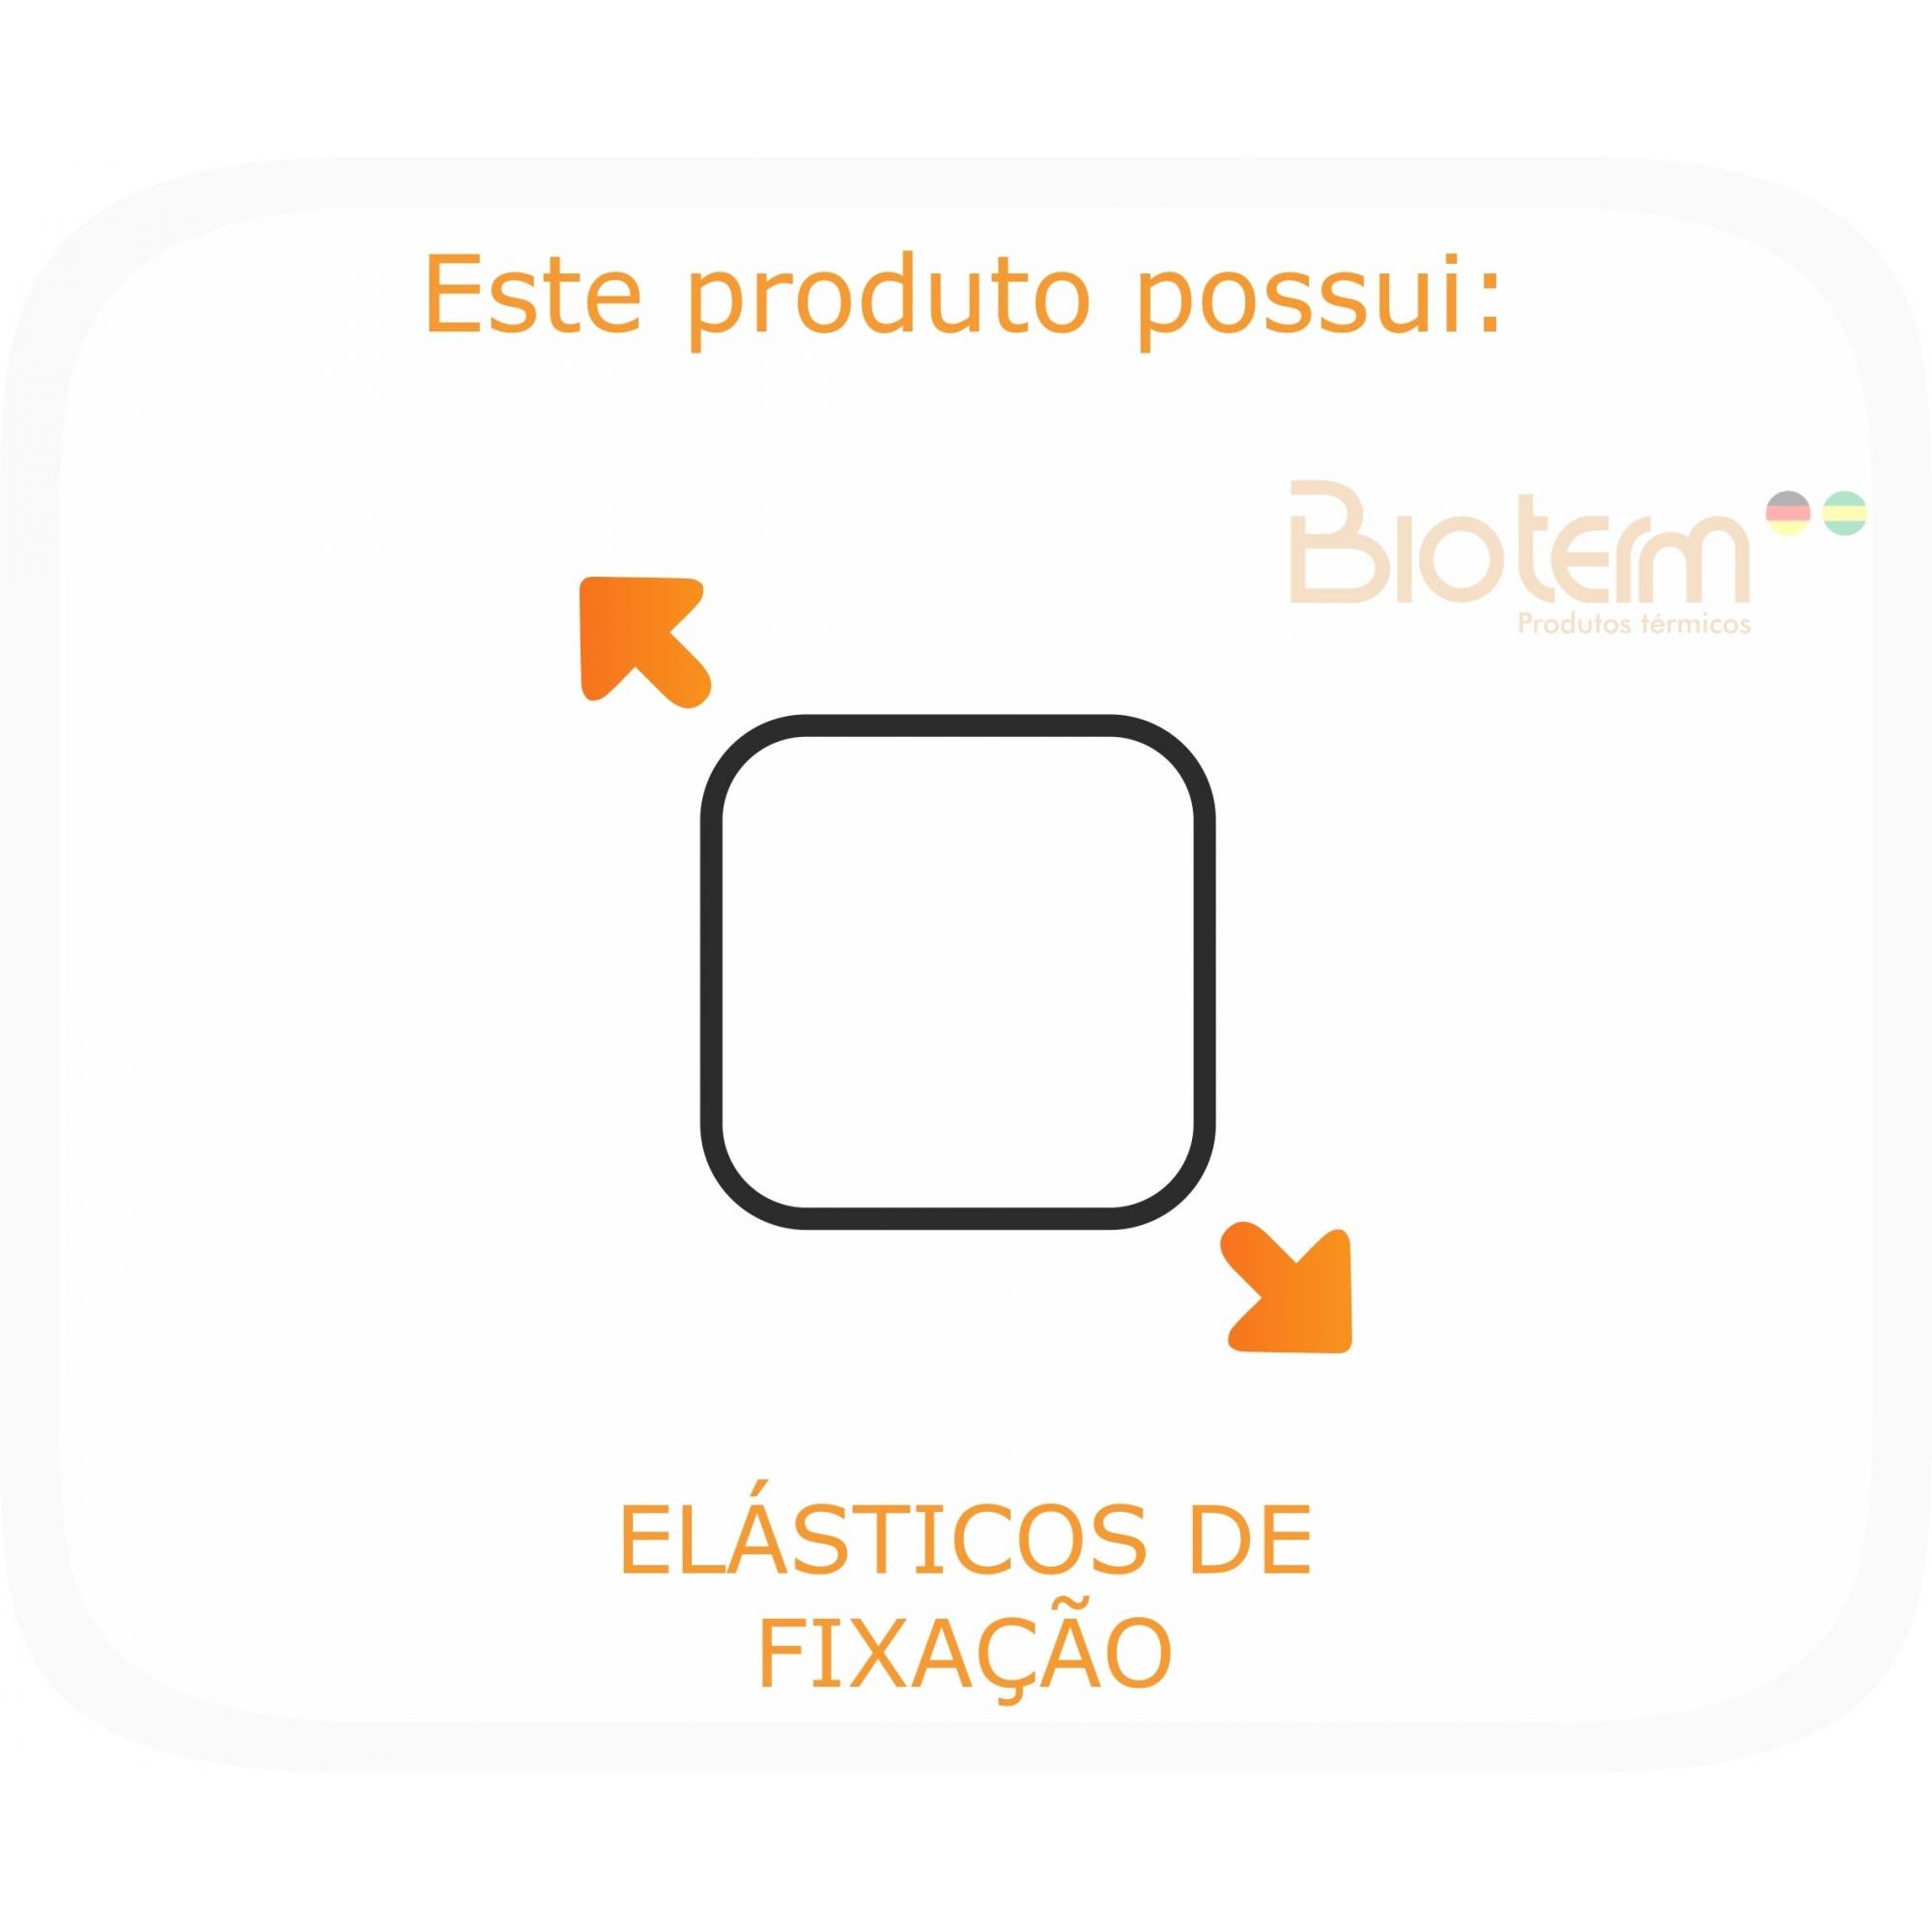 Lençol Térmico Casal Digital Bivolt Automatico Bio Term